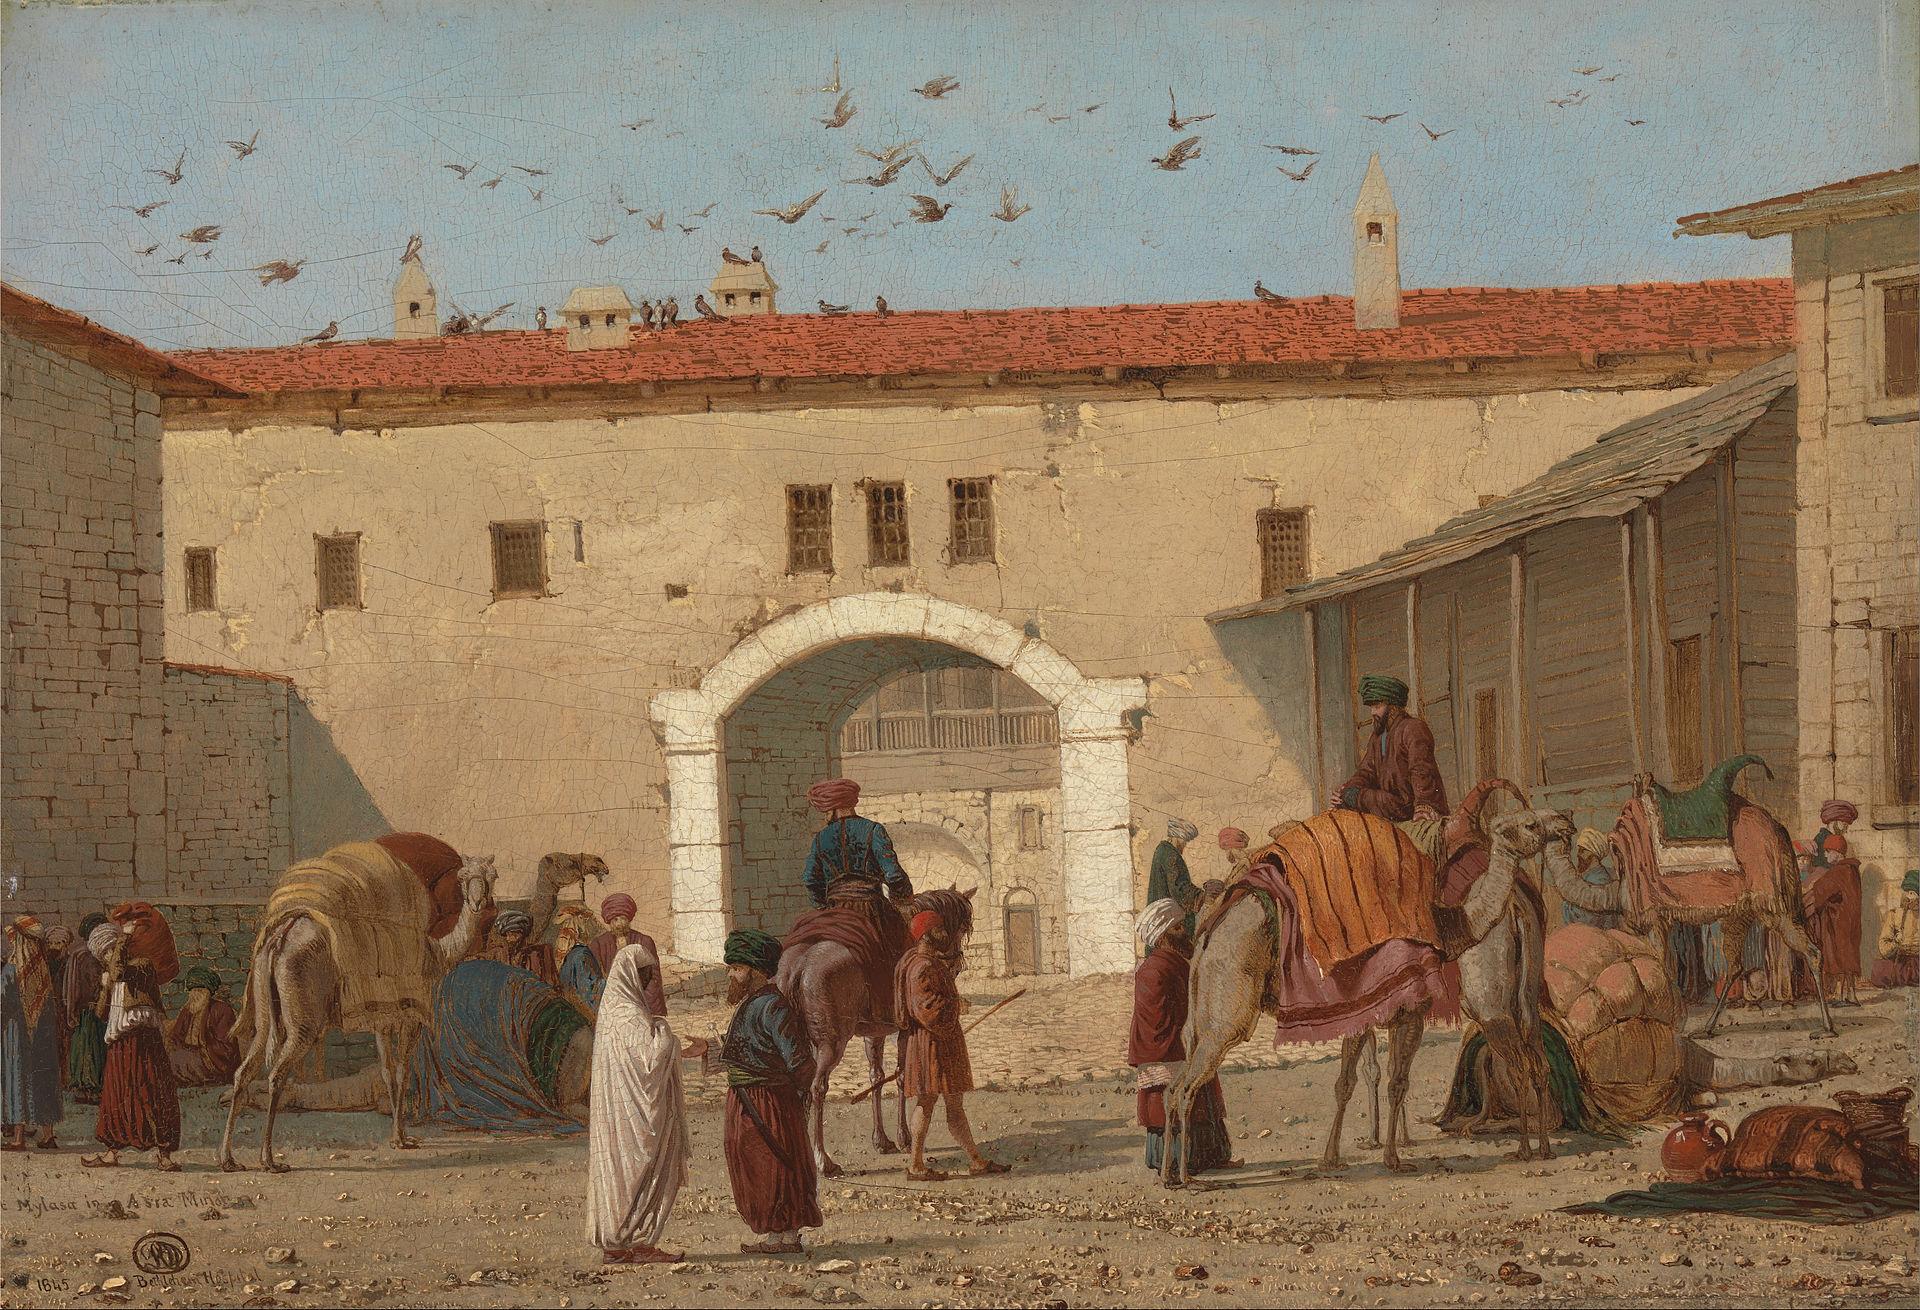 1920px-Richard_Dadd_-_Caravanserai_at_Mylasa_in_Asia_Minor_-_Google_Art_Project.jpg